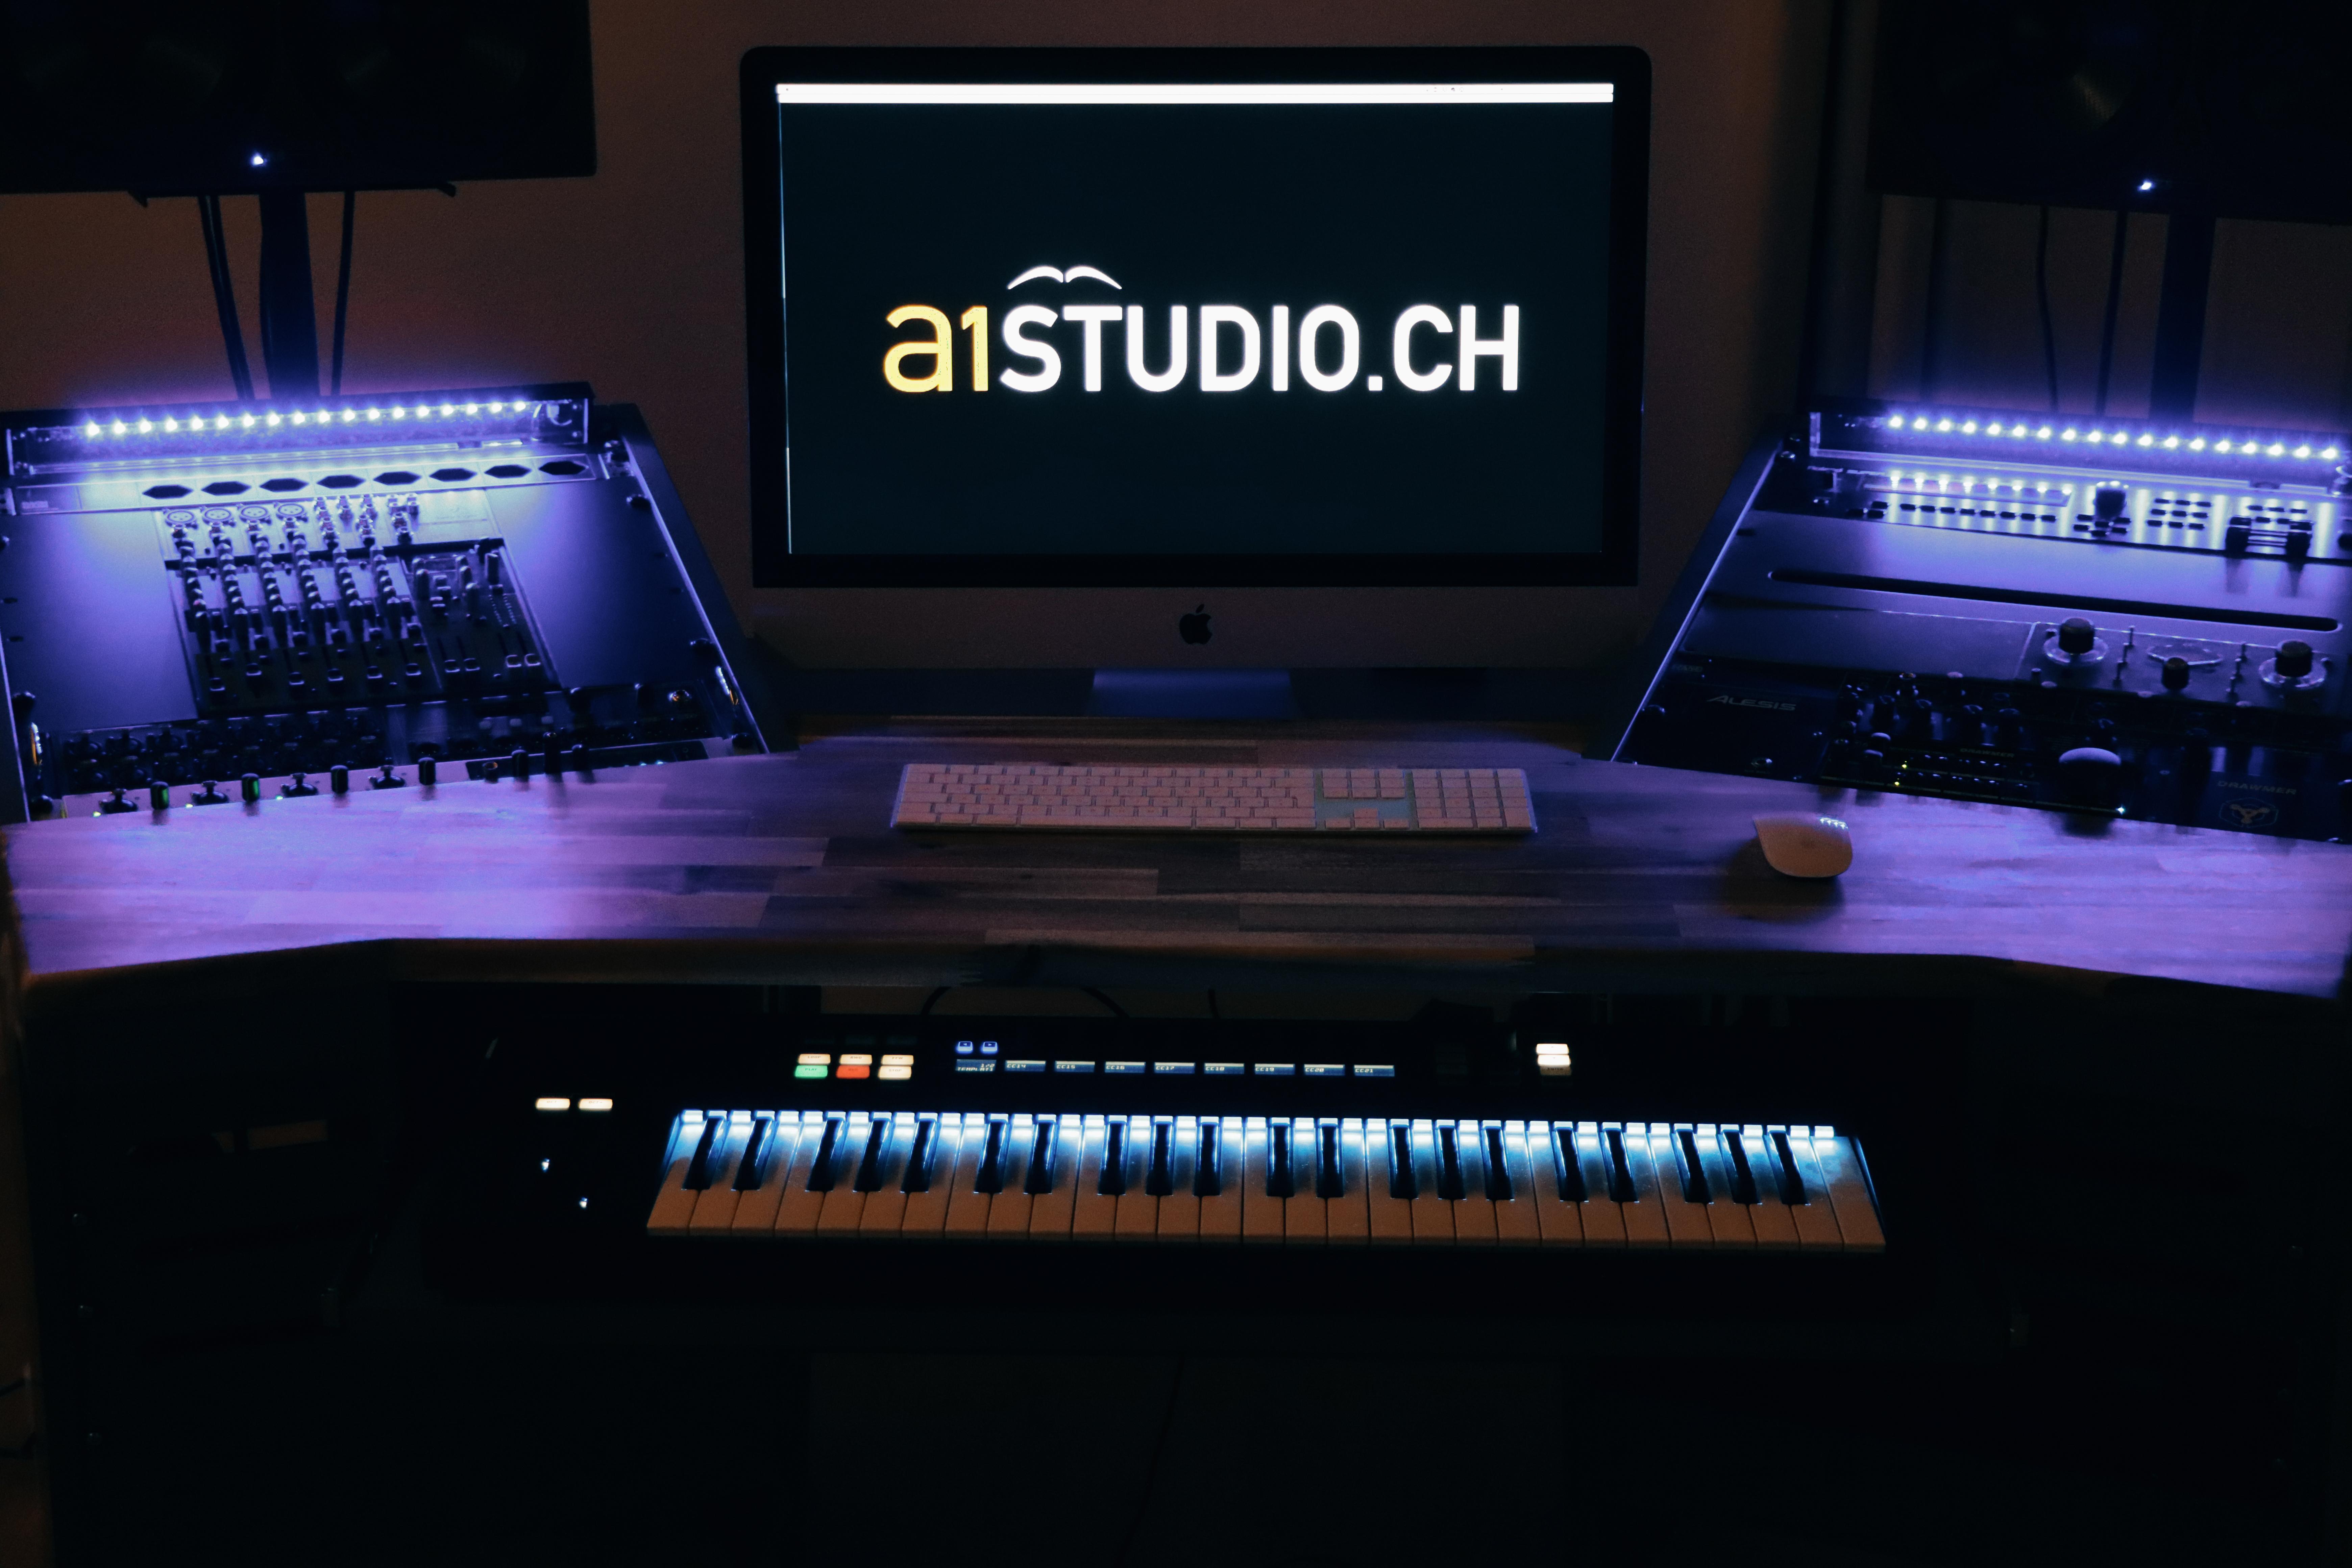 Tonstudio Deitingen, Solothurn, Schweiz, Werbejingles, Radiojingle, Sprachaufnahme, Steinway Flügel, Voice over, Filmmusik, Komponist, Songwriter, Proberaum